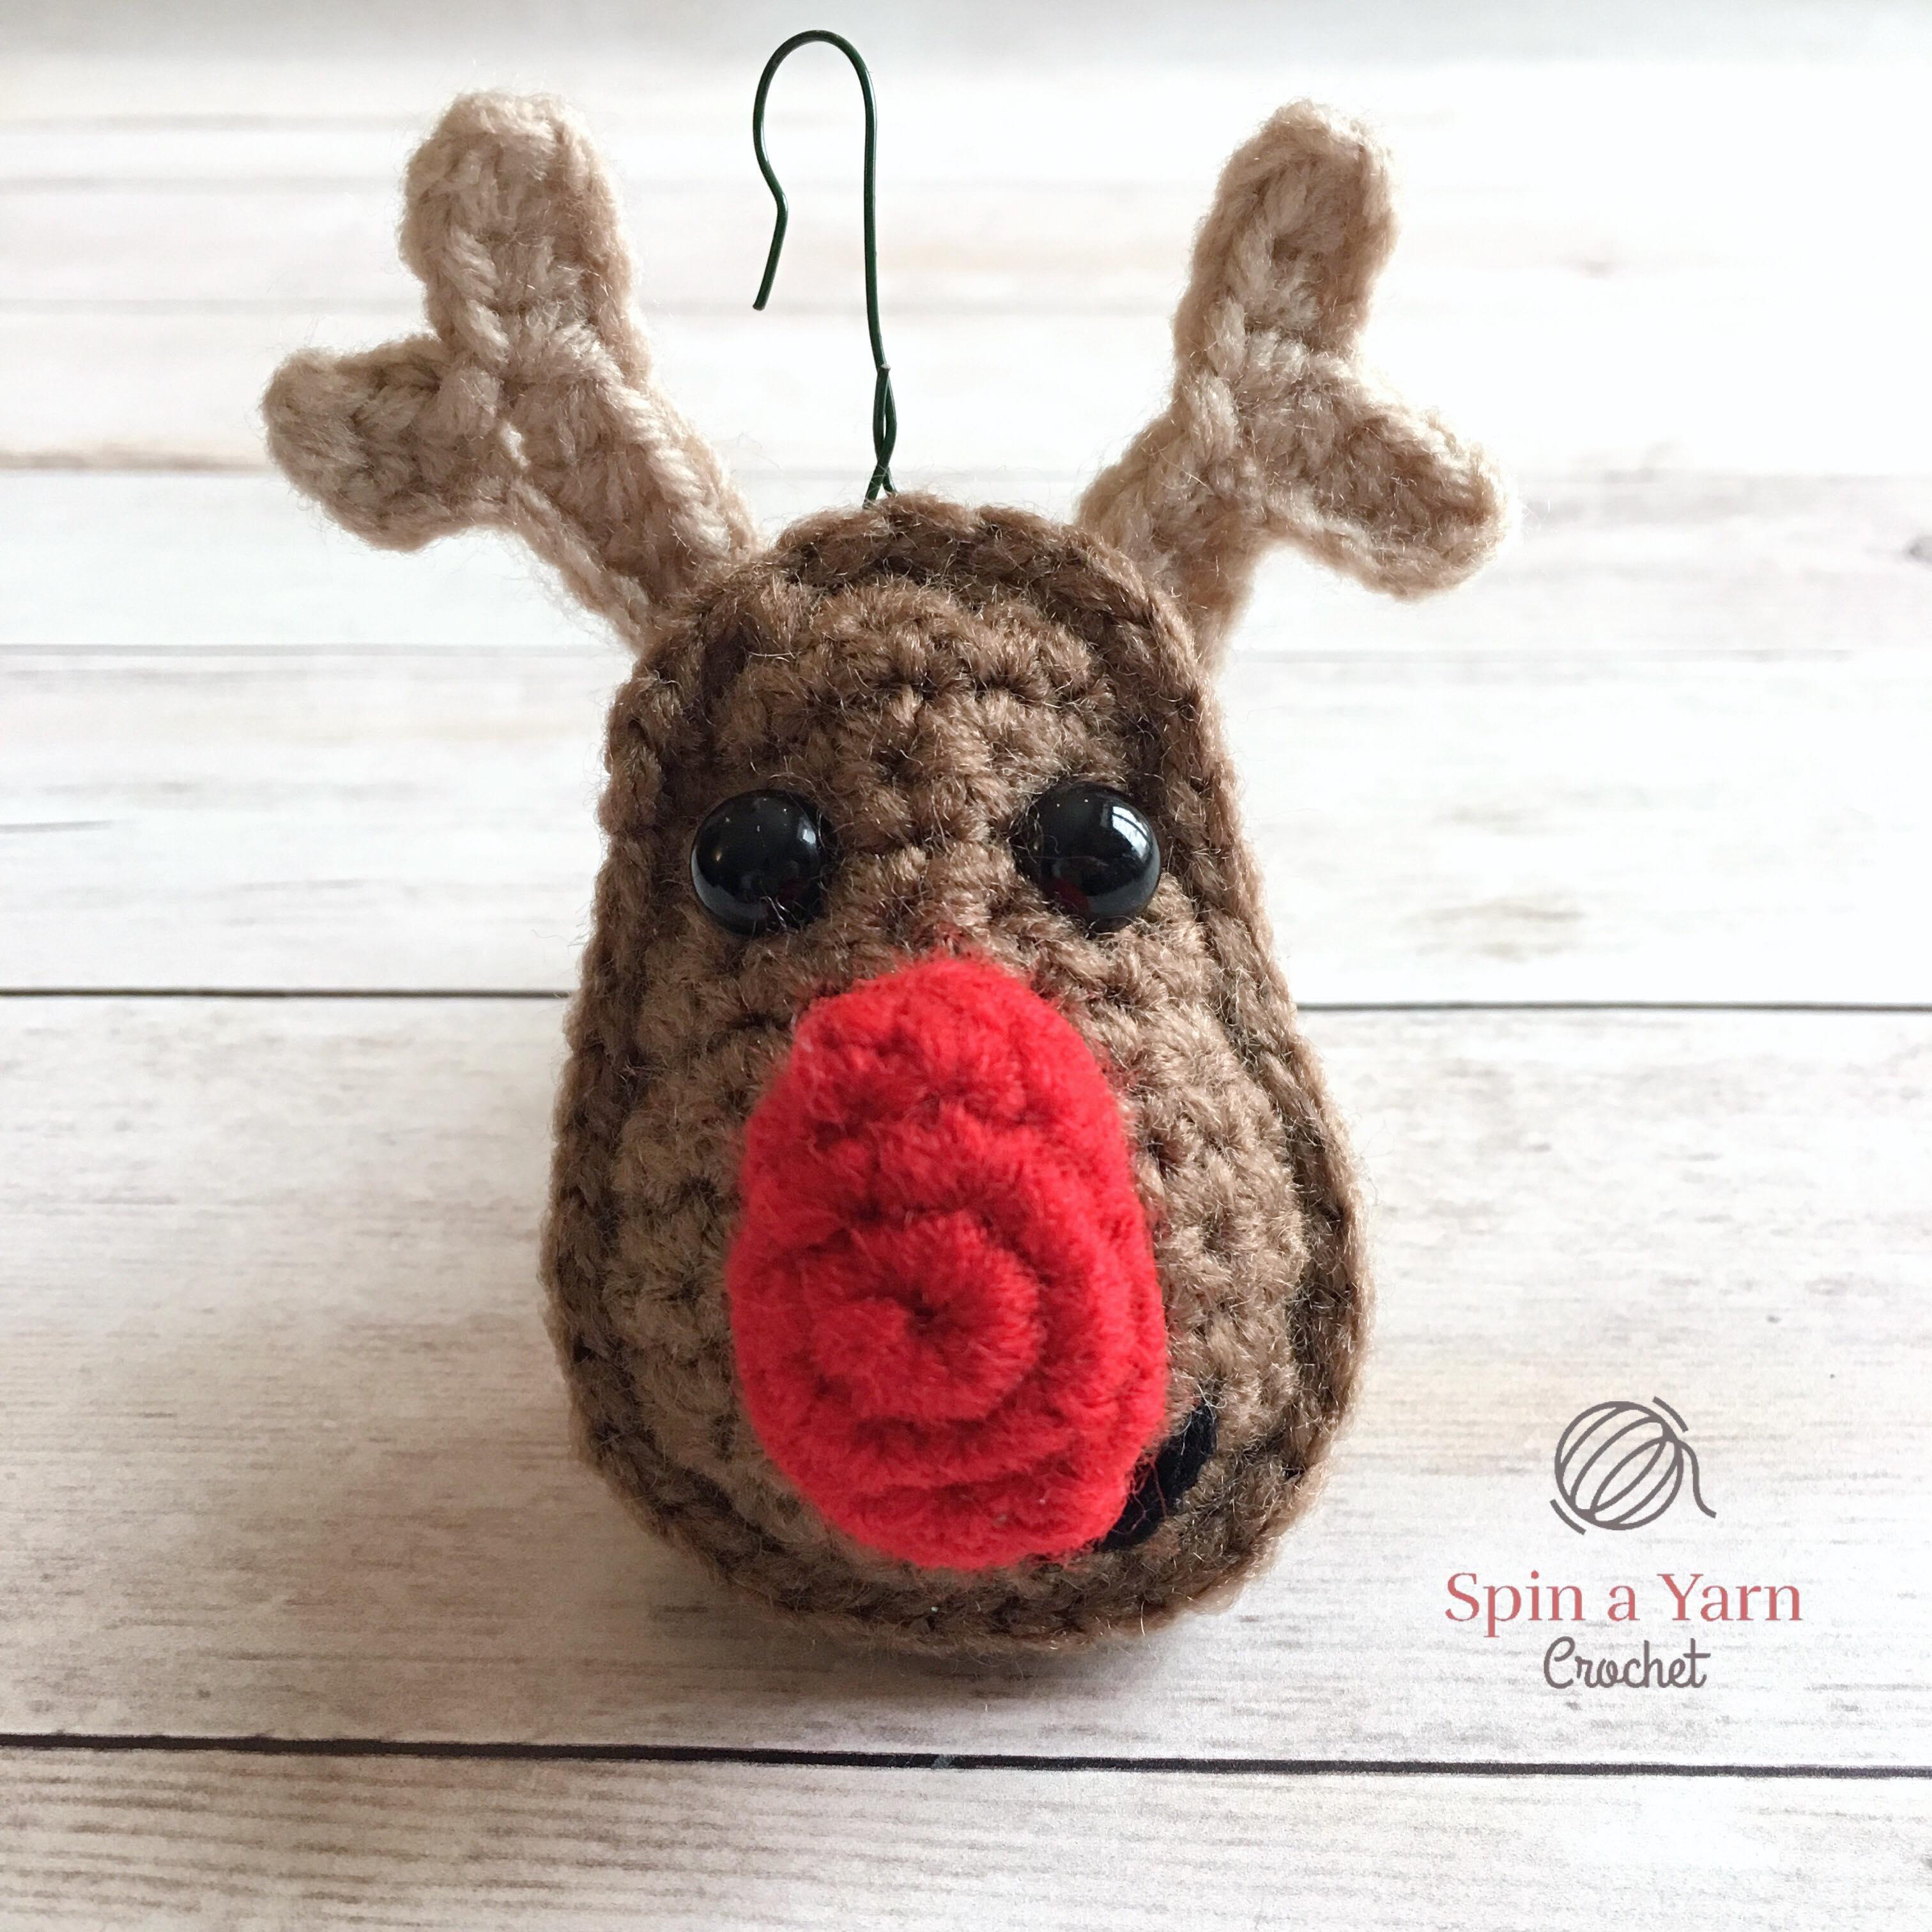 Reindeer Ornament Free Crochet Pattern • Spin a Yarn Crochet 852cfd77e0f